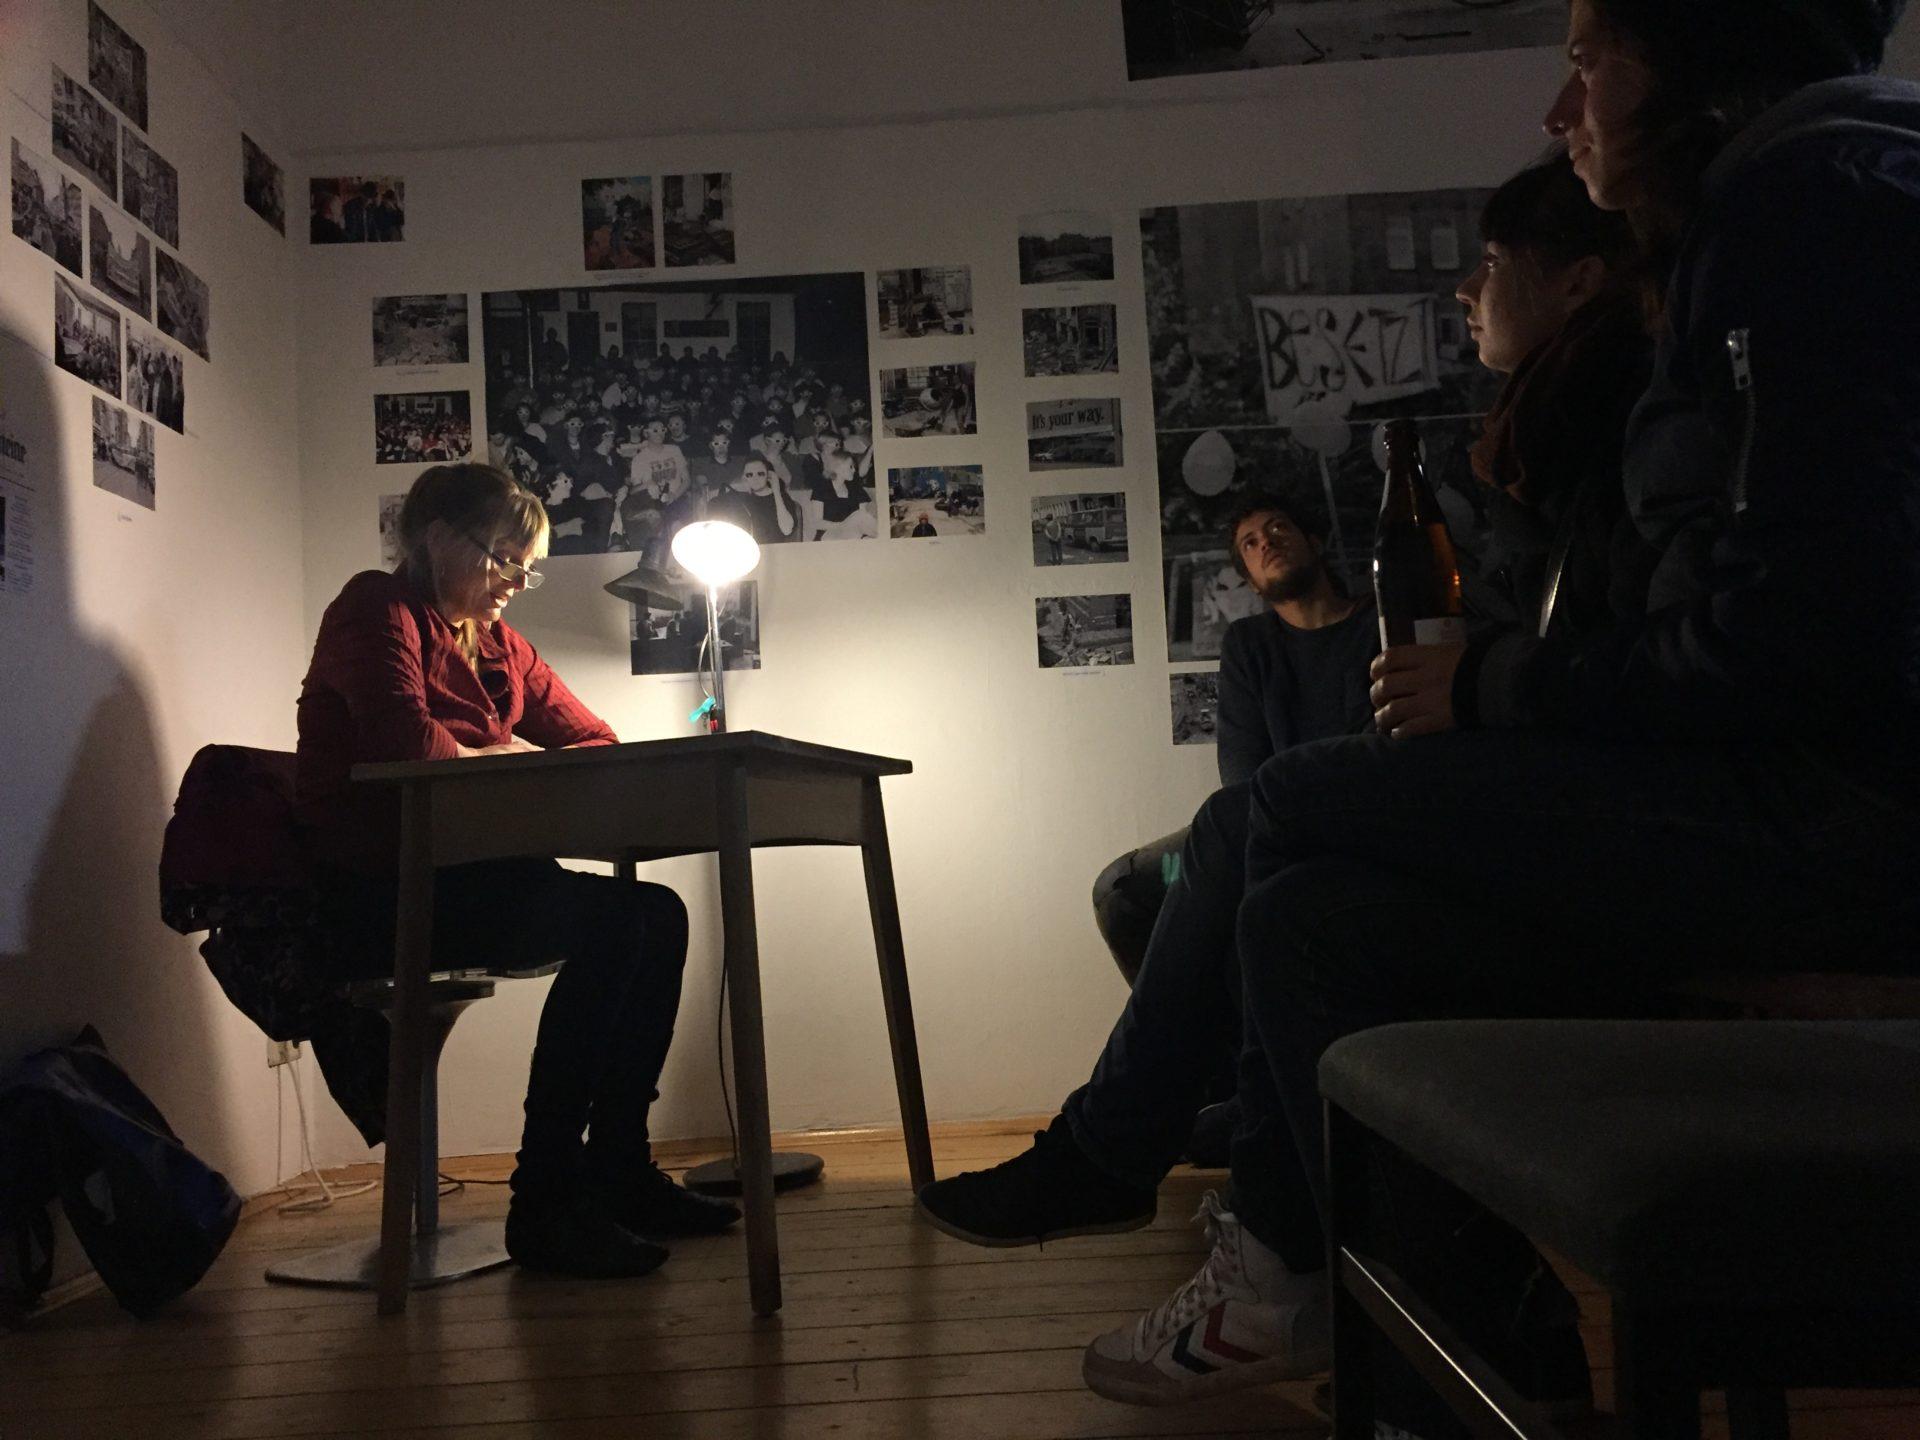 Frauen im Musikbusiness - Punk-Autorin Ute Wieners 2